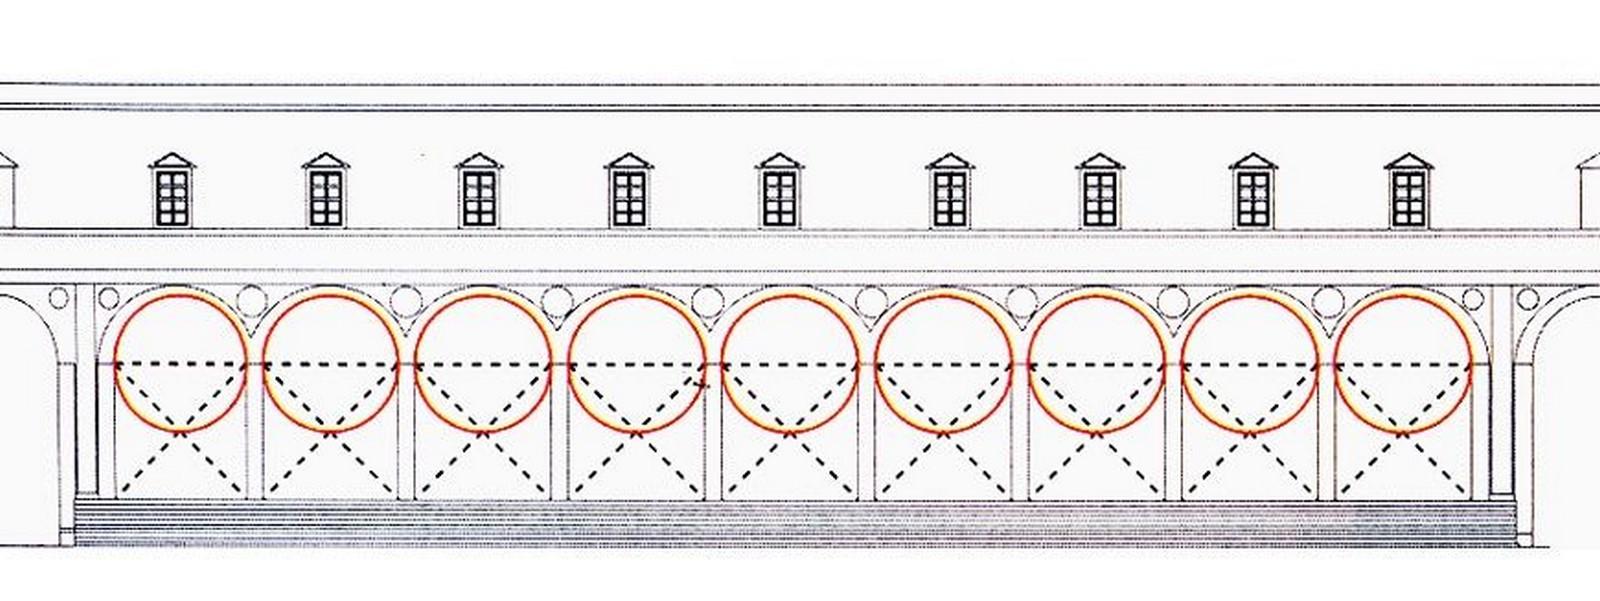 Ospedale degli Innocenti, Florence (c.1419-27) - Sheet2